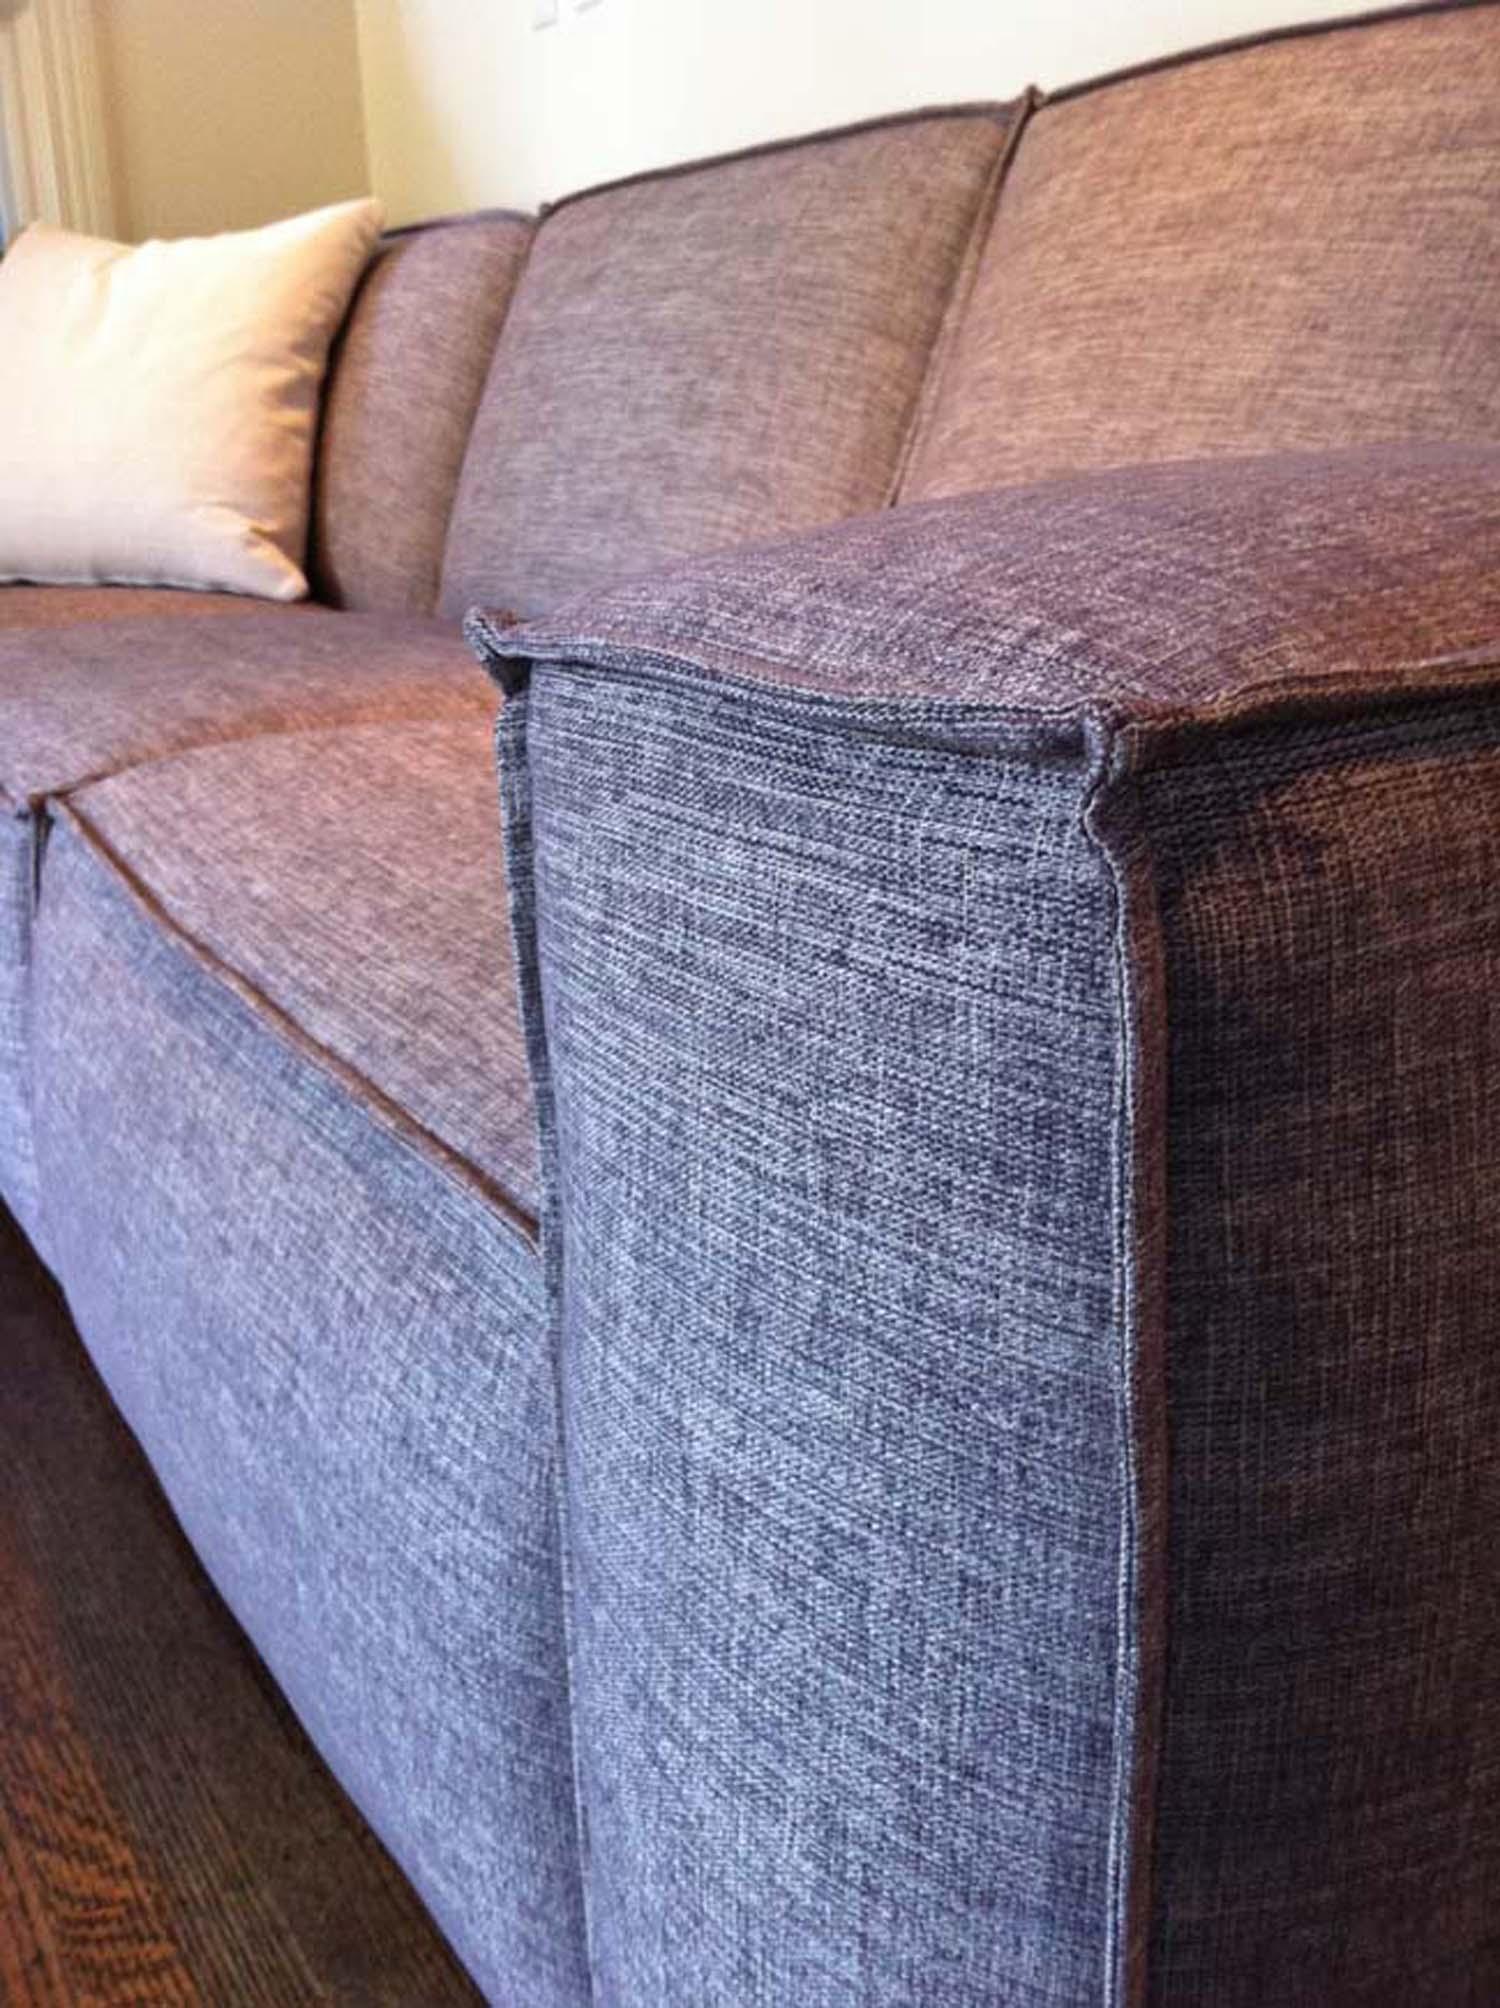 Pops sofa with French seam trim